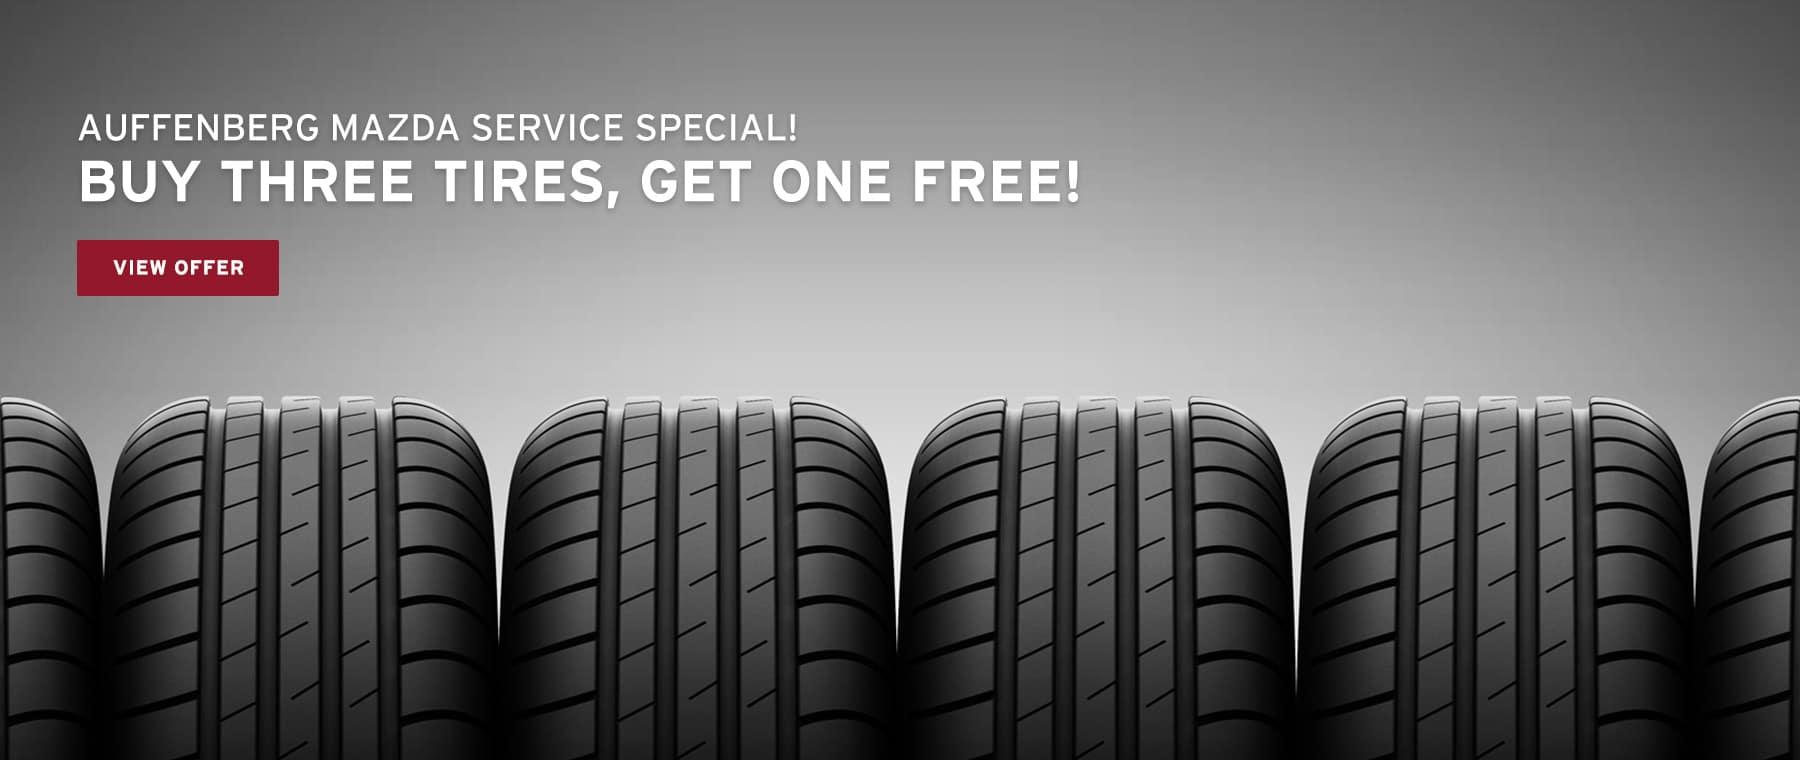 Auffenberg Mazda Tire Special